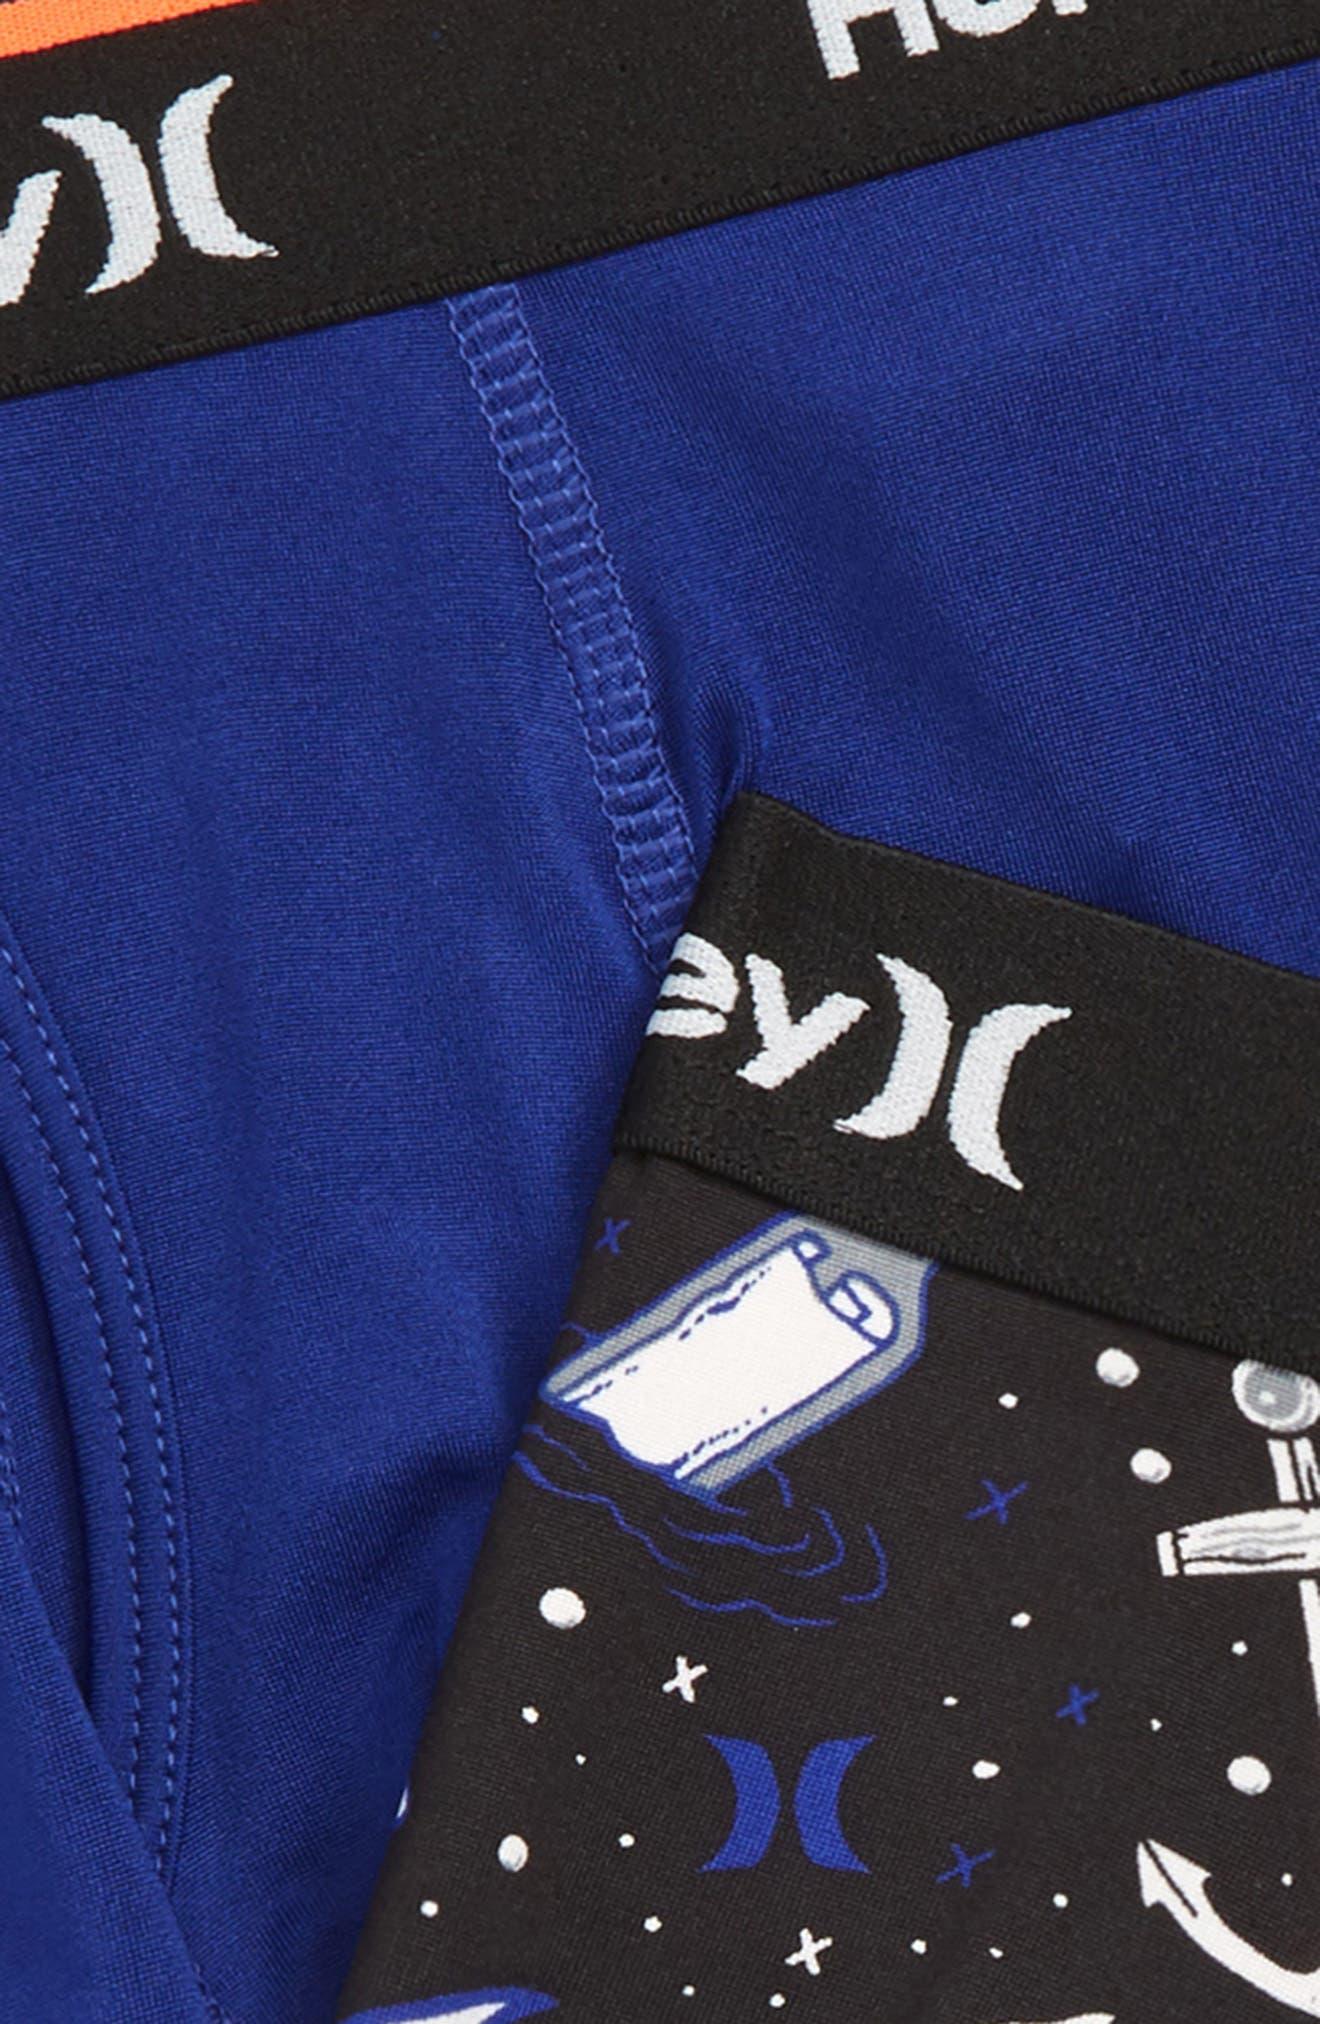 Shark Attack 2-Pack Boxer Briefs,                             Alternate thumbnail 2, color,                             DEEP ROYAL BLUE